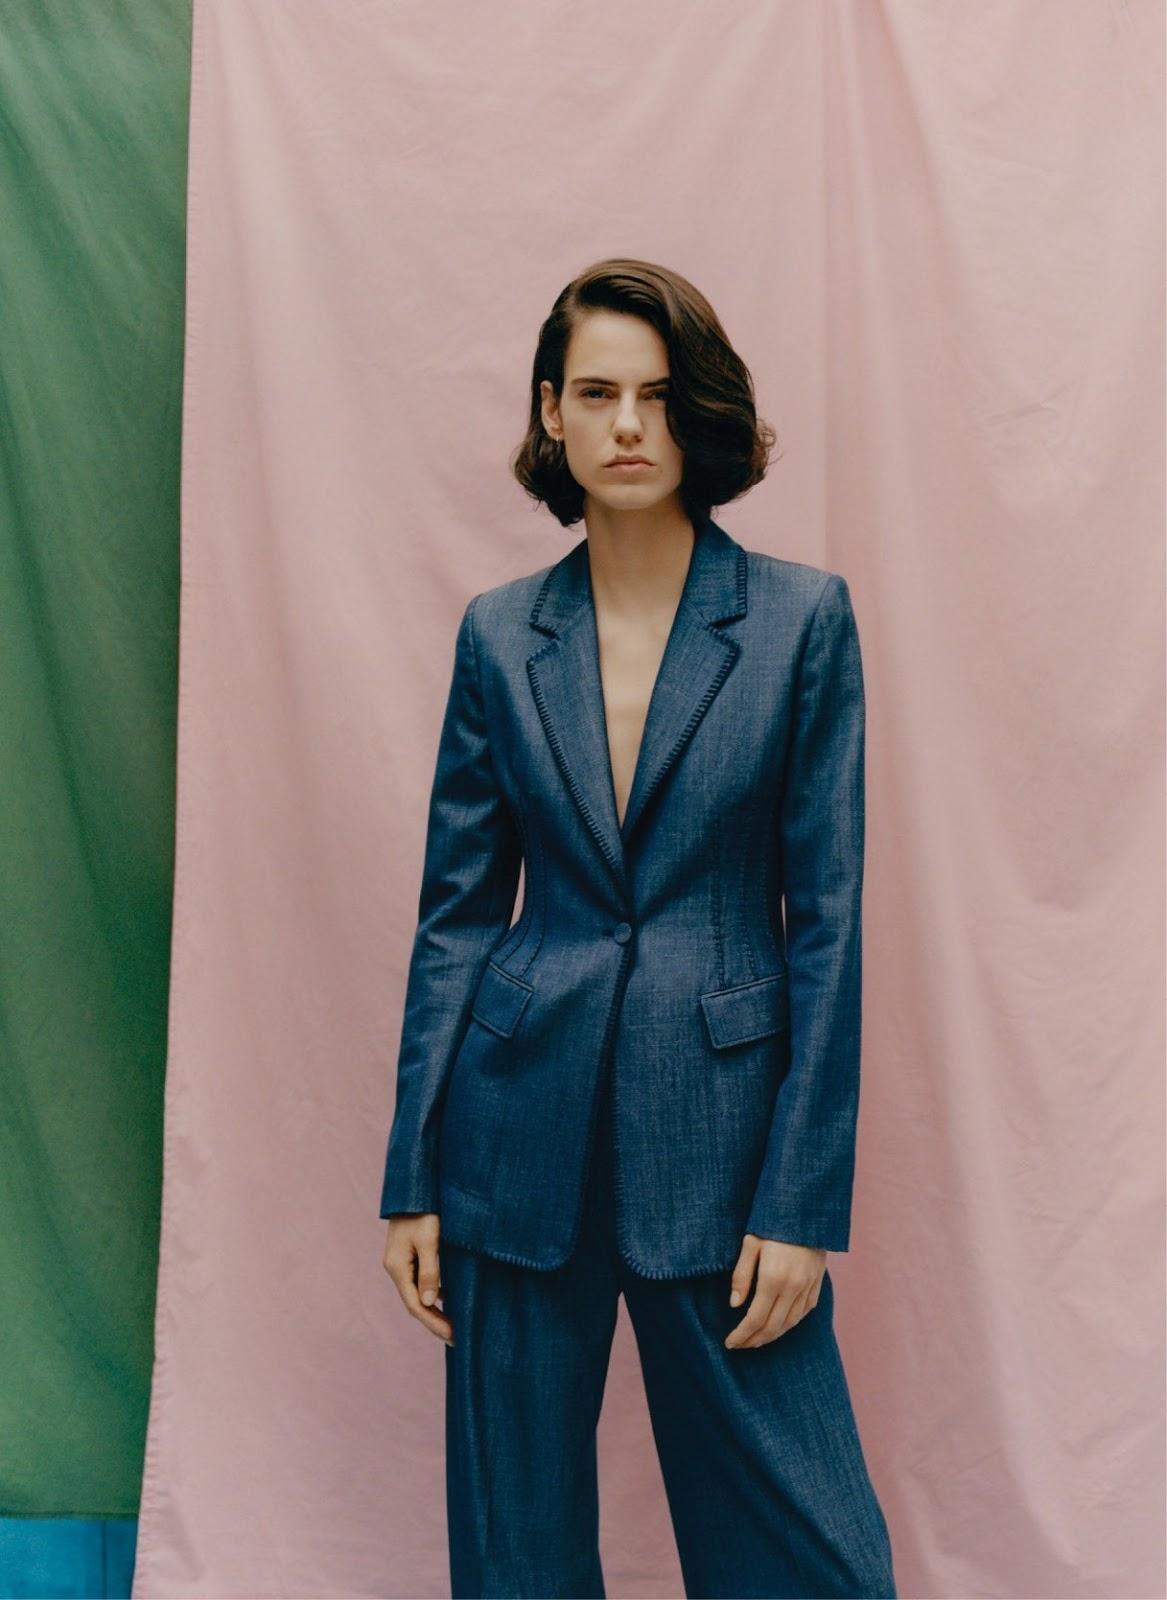 Miriam Sanchez in Gabriela Hearst blazer and pants